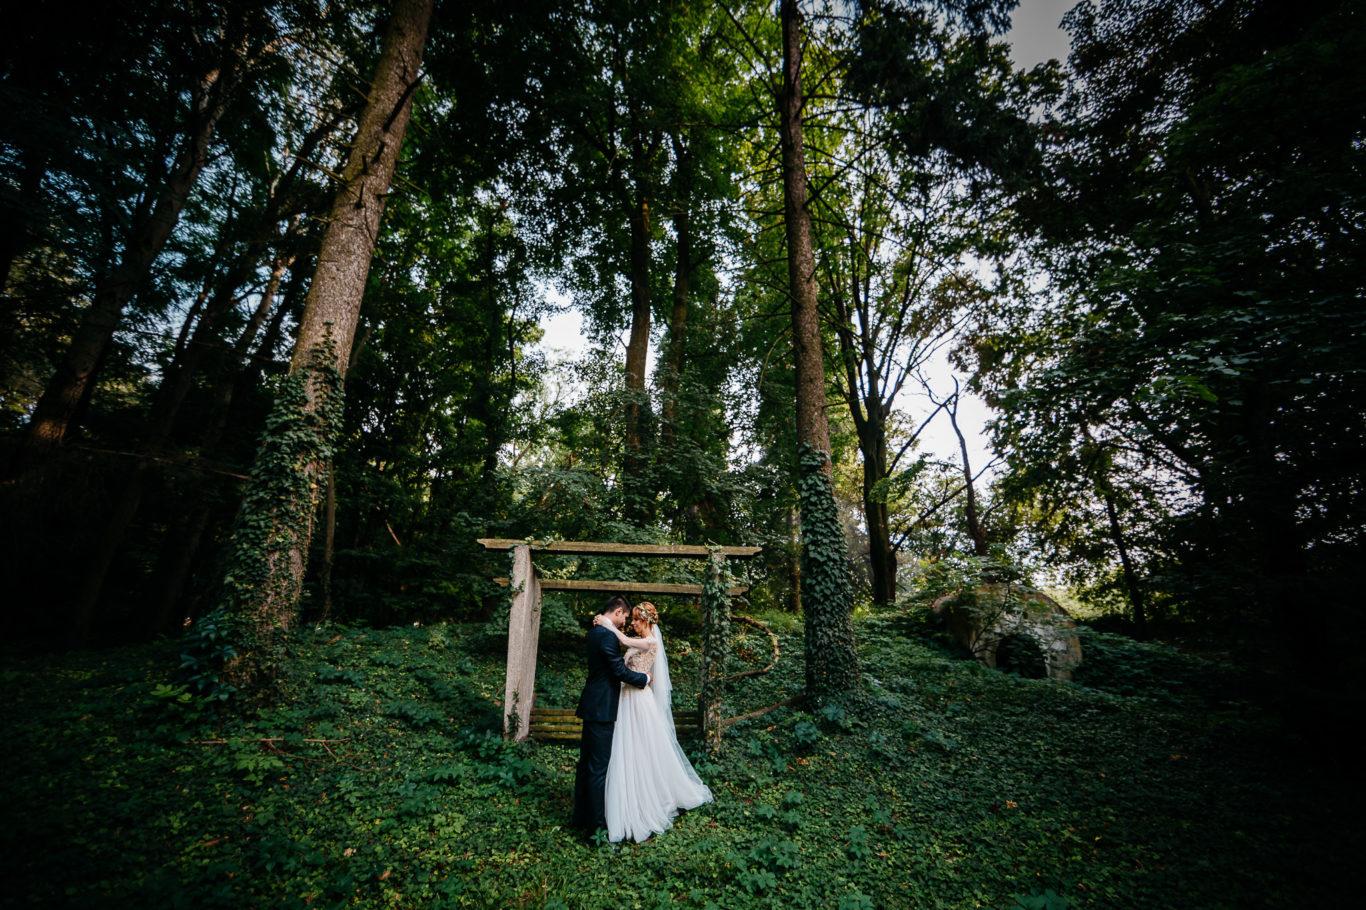 0207-Fotografie-nunta-Stirbey-Laura-Rares-fotograf-Ciprian-Dumitrescu-CDF_0249 (2)